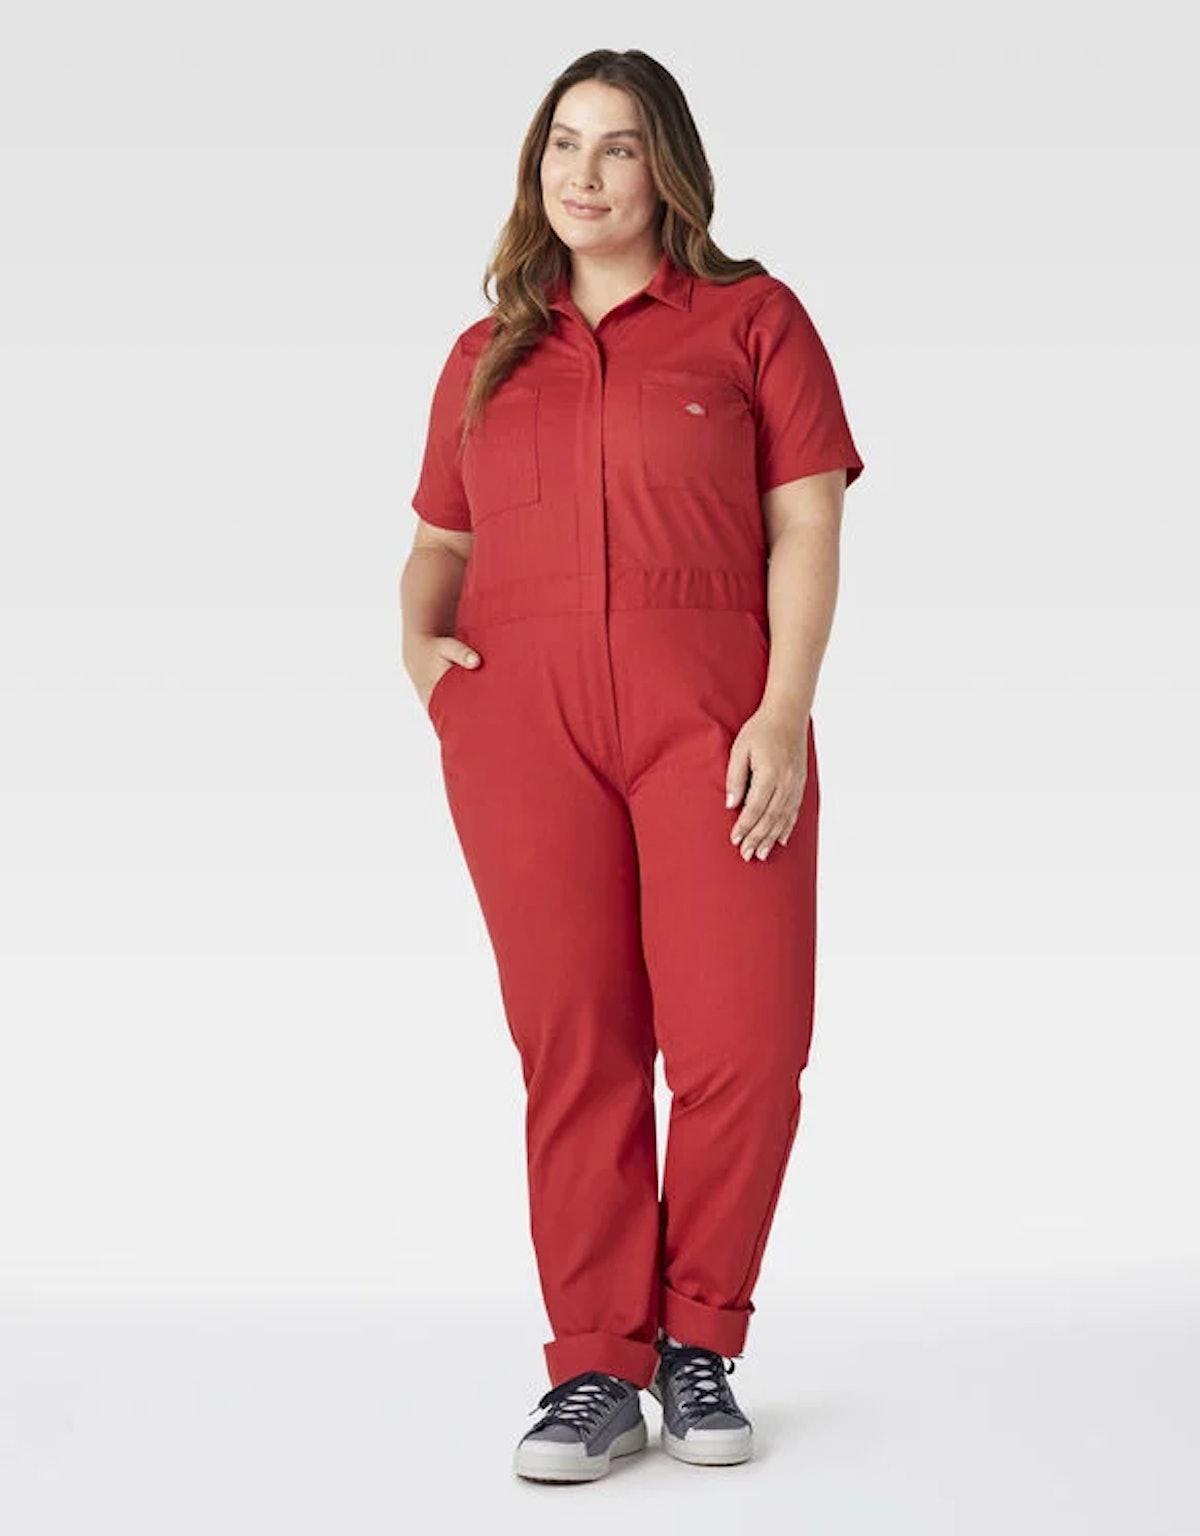 Dickies Women's Plus FLEX Temp-iQ Short Sleeve Coveralls, English Red